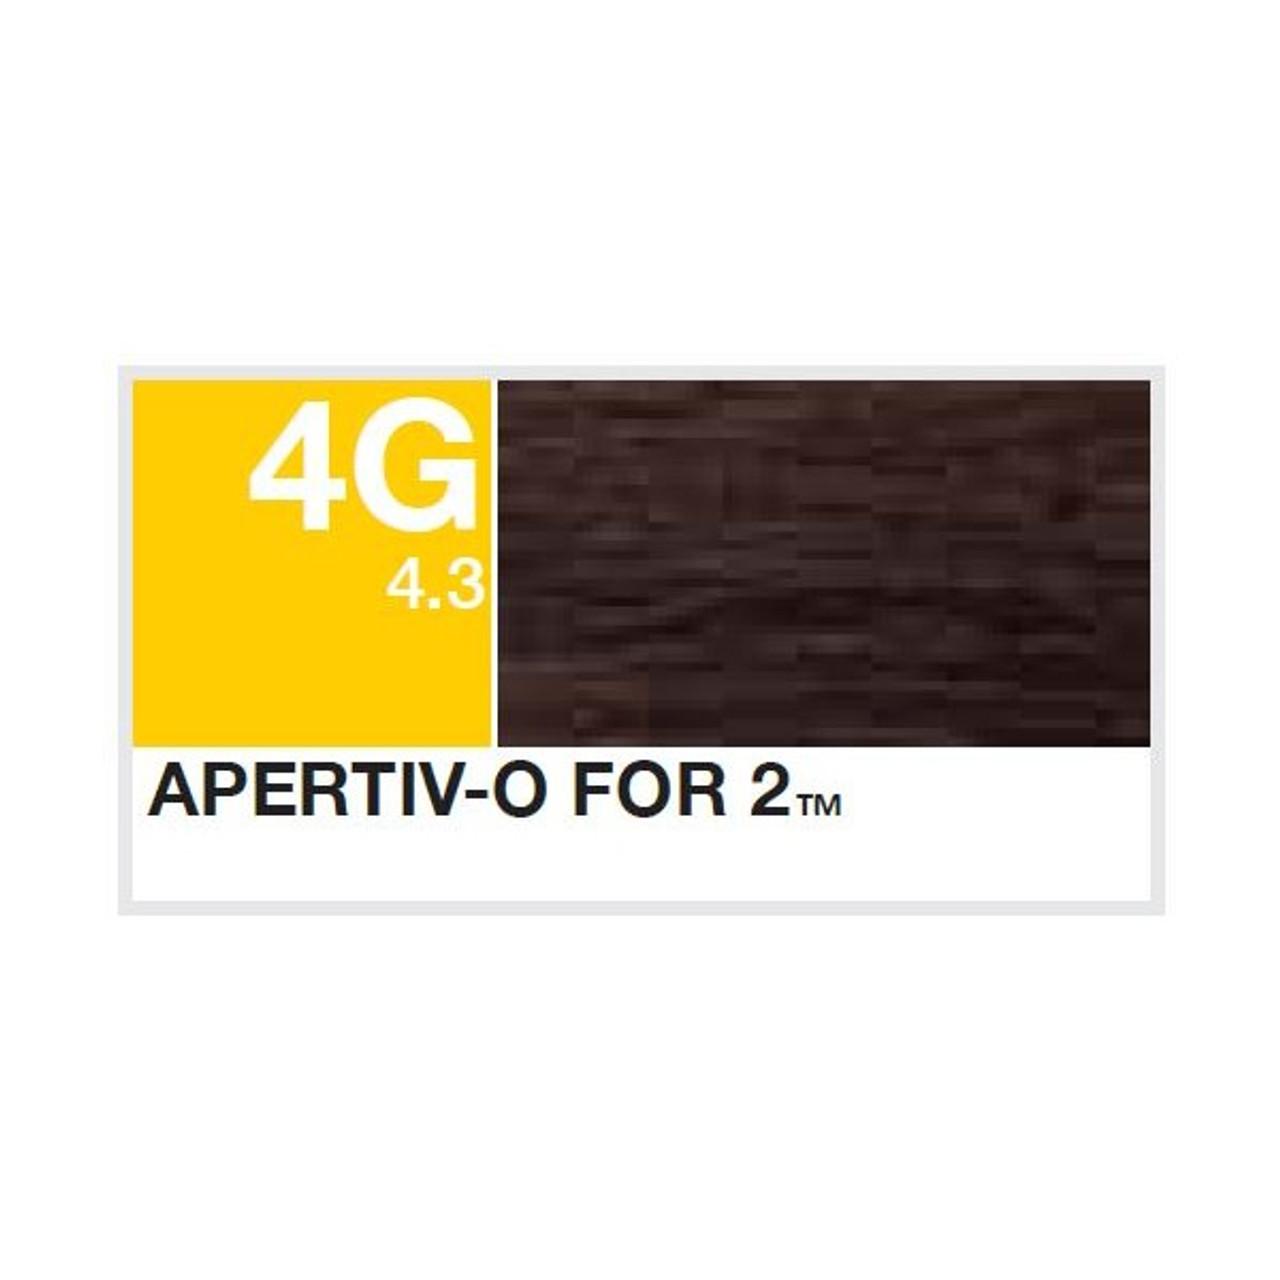 Aloxxi 4G Creme Color:  Apertiv-o for 2